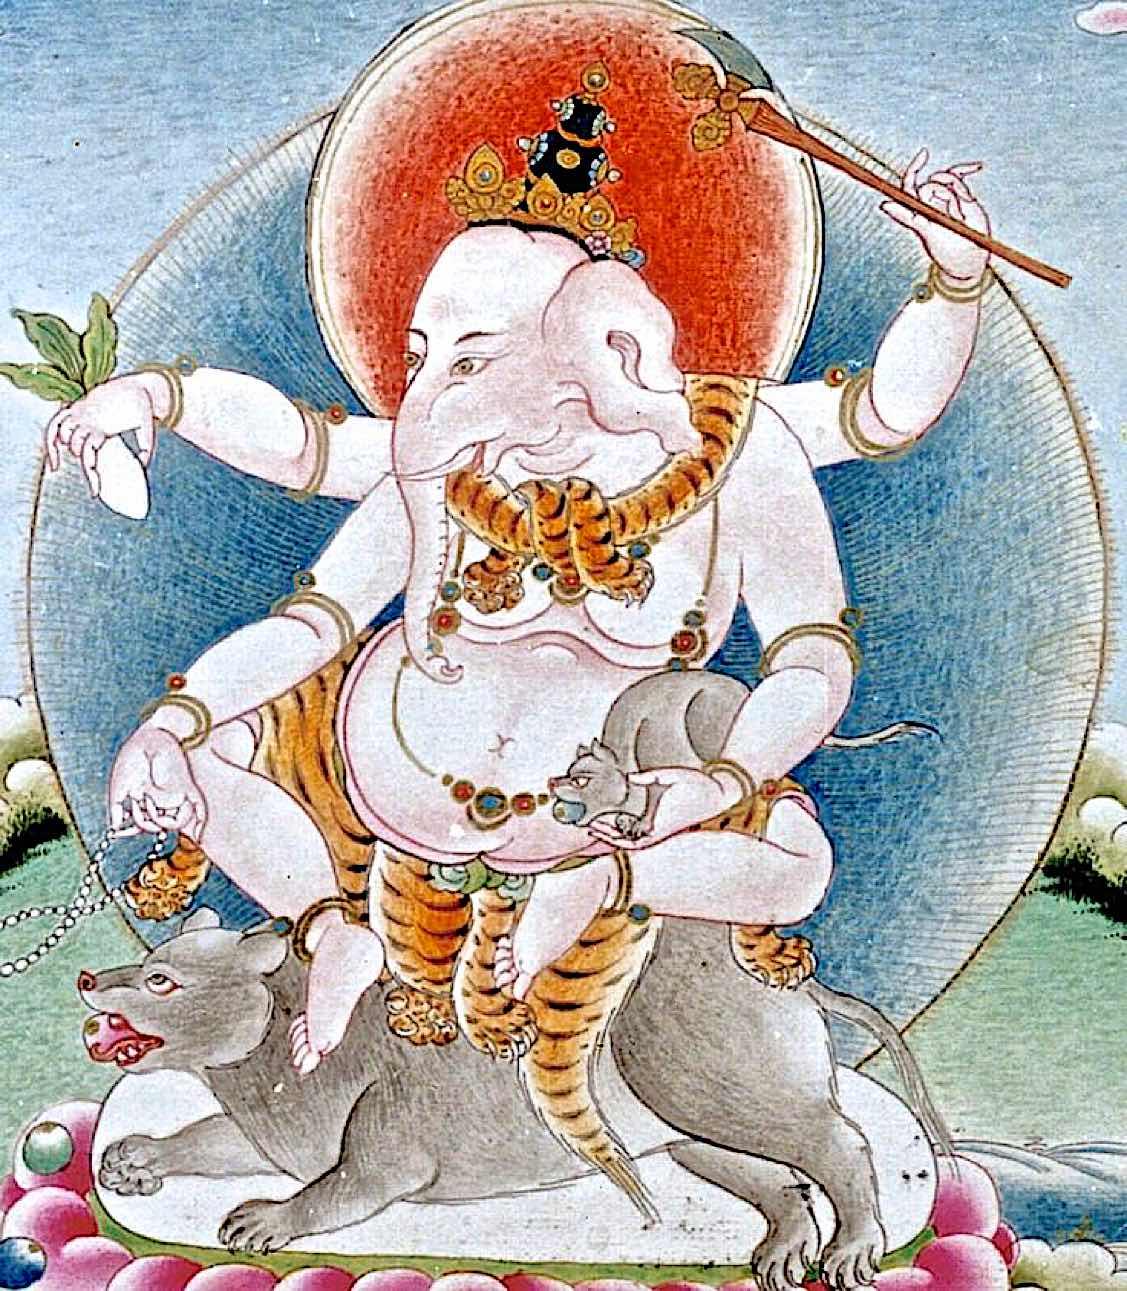 Buddhist Ganesha: popular Ganapati's many forms include